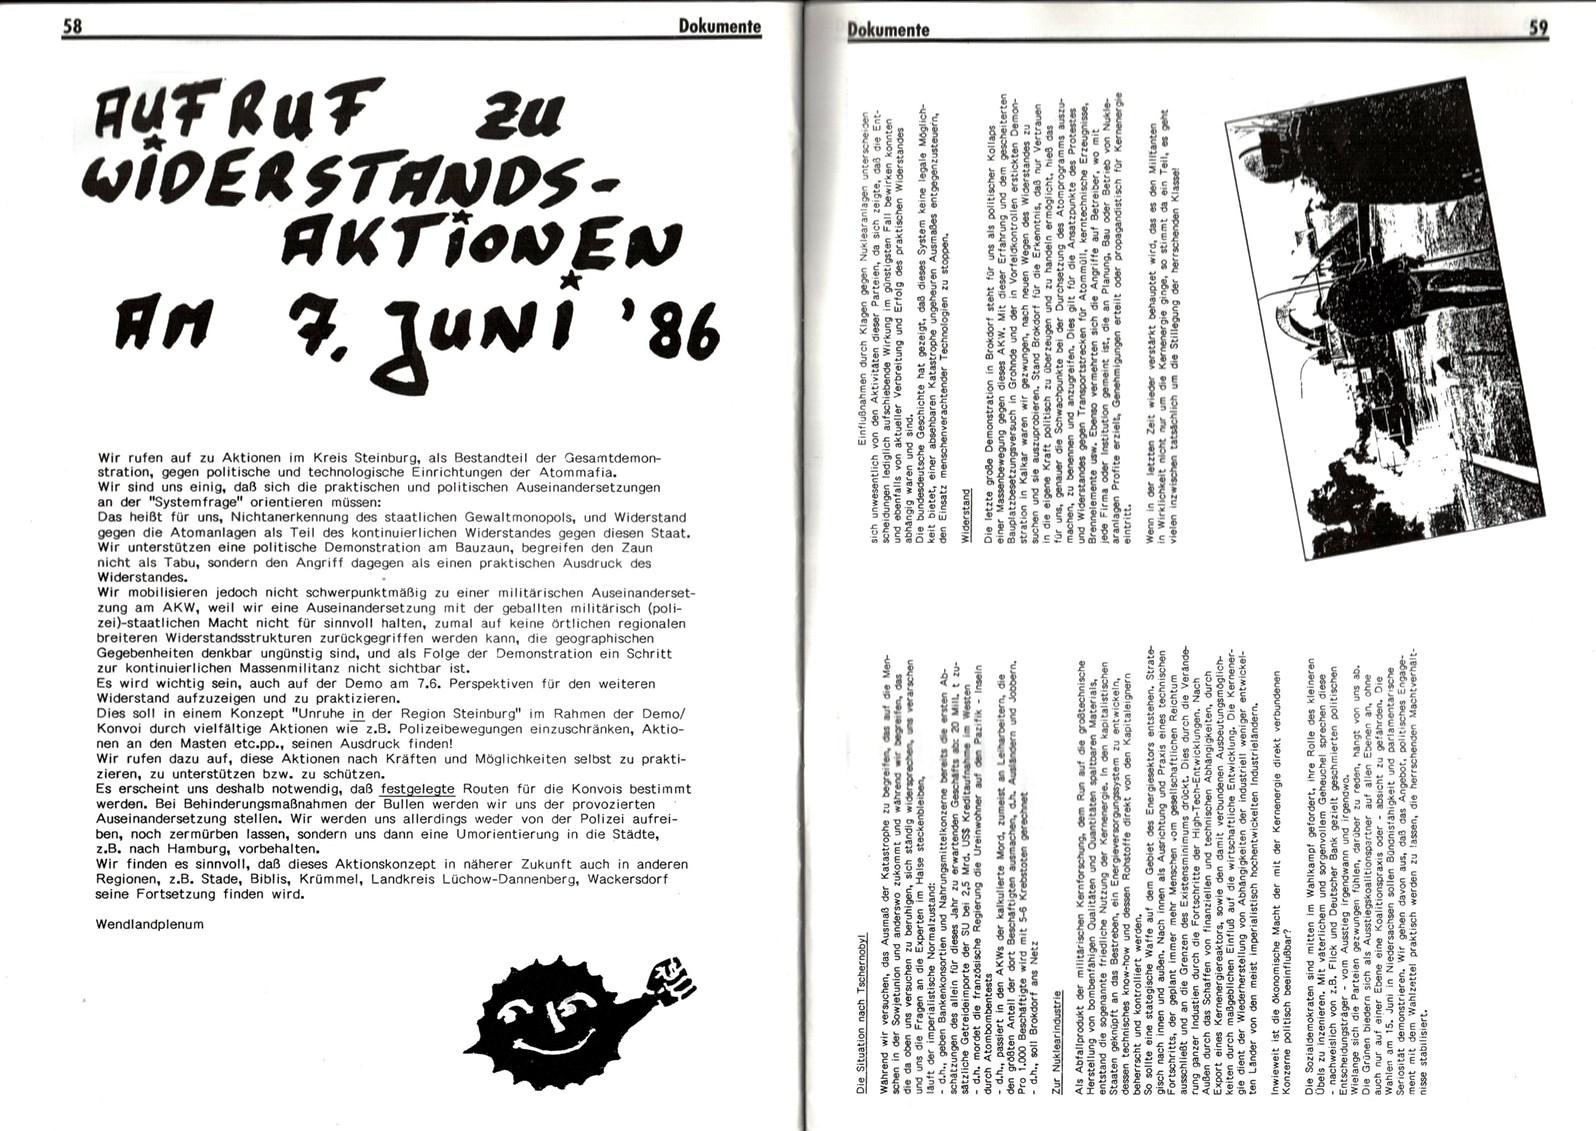 NOR_AKW_1986_Brokdorf_Kleve_Hamburg_030